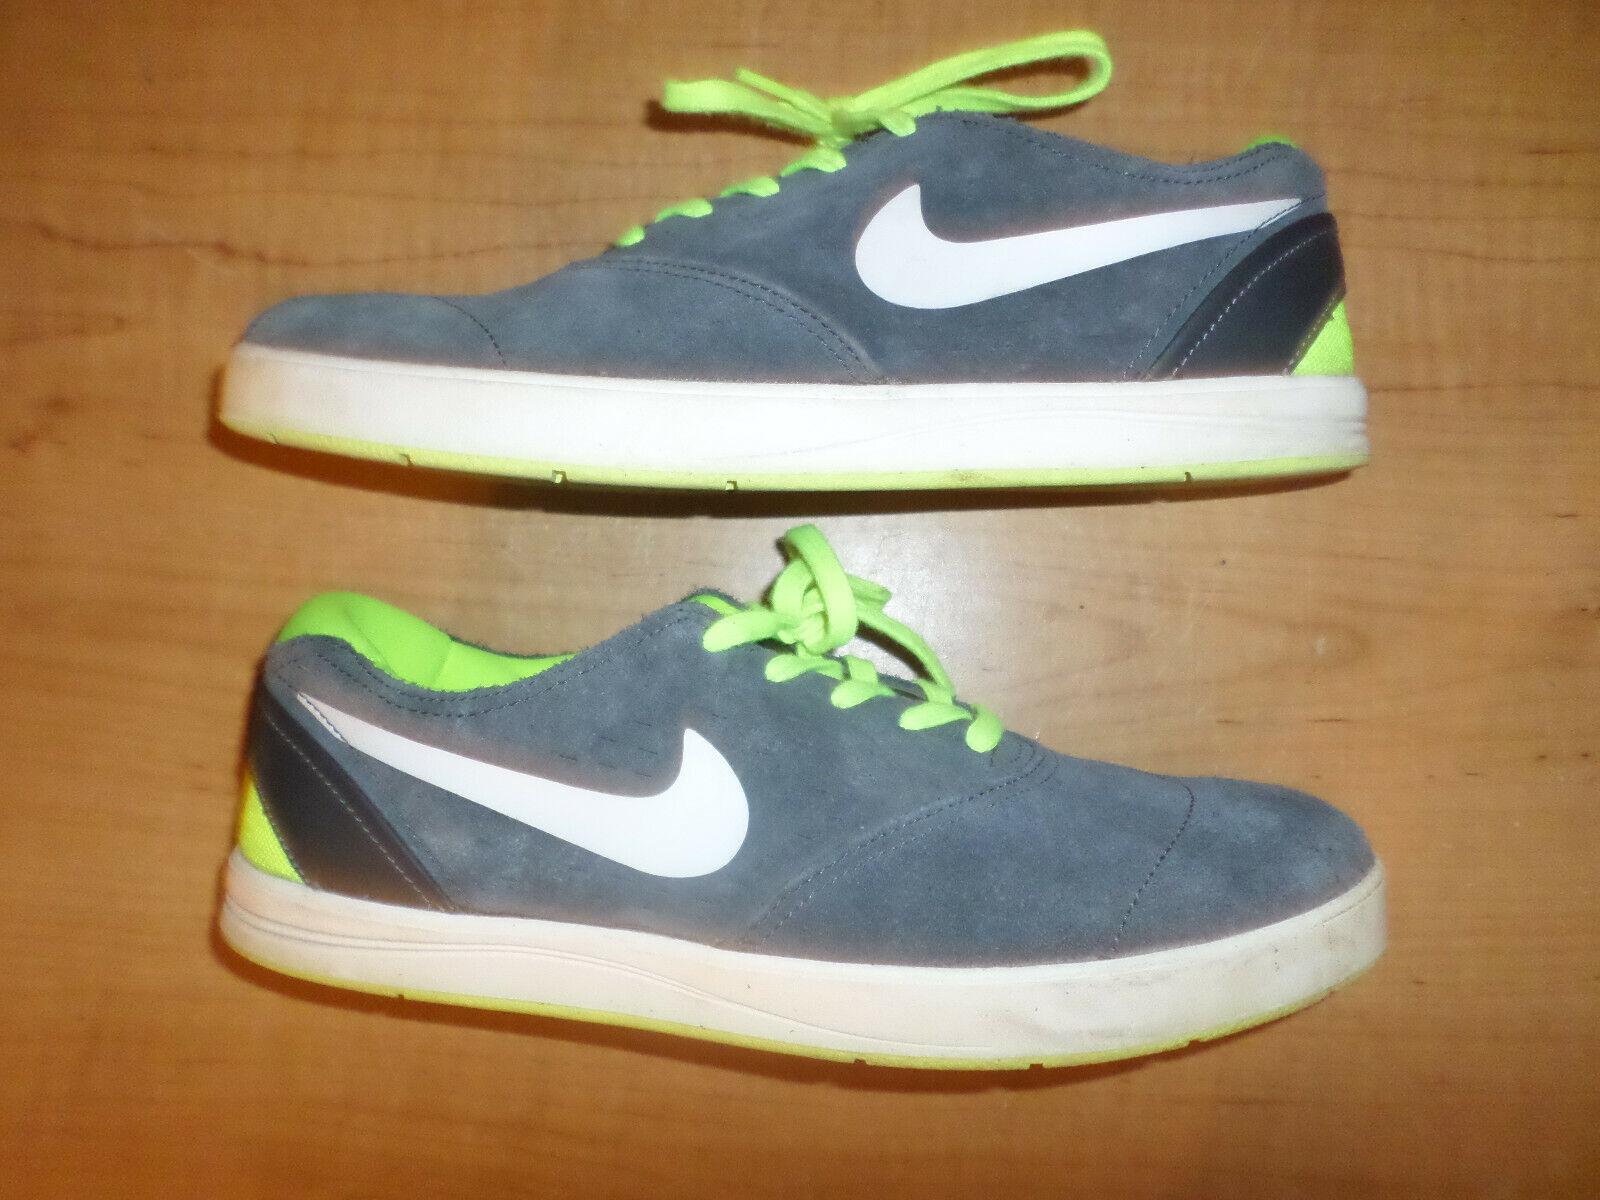 Desarrollar Instantáneamente Inferir  Nike SB Eric Koston 2 Lunarlon 580418-301 MINT Blue Suede Men's Size 10.5  for sale online | eBay